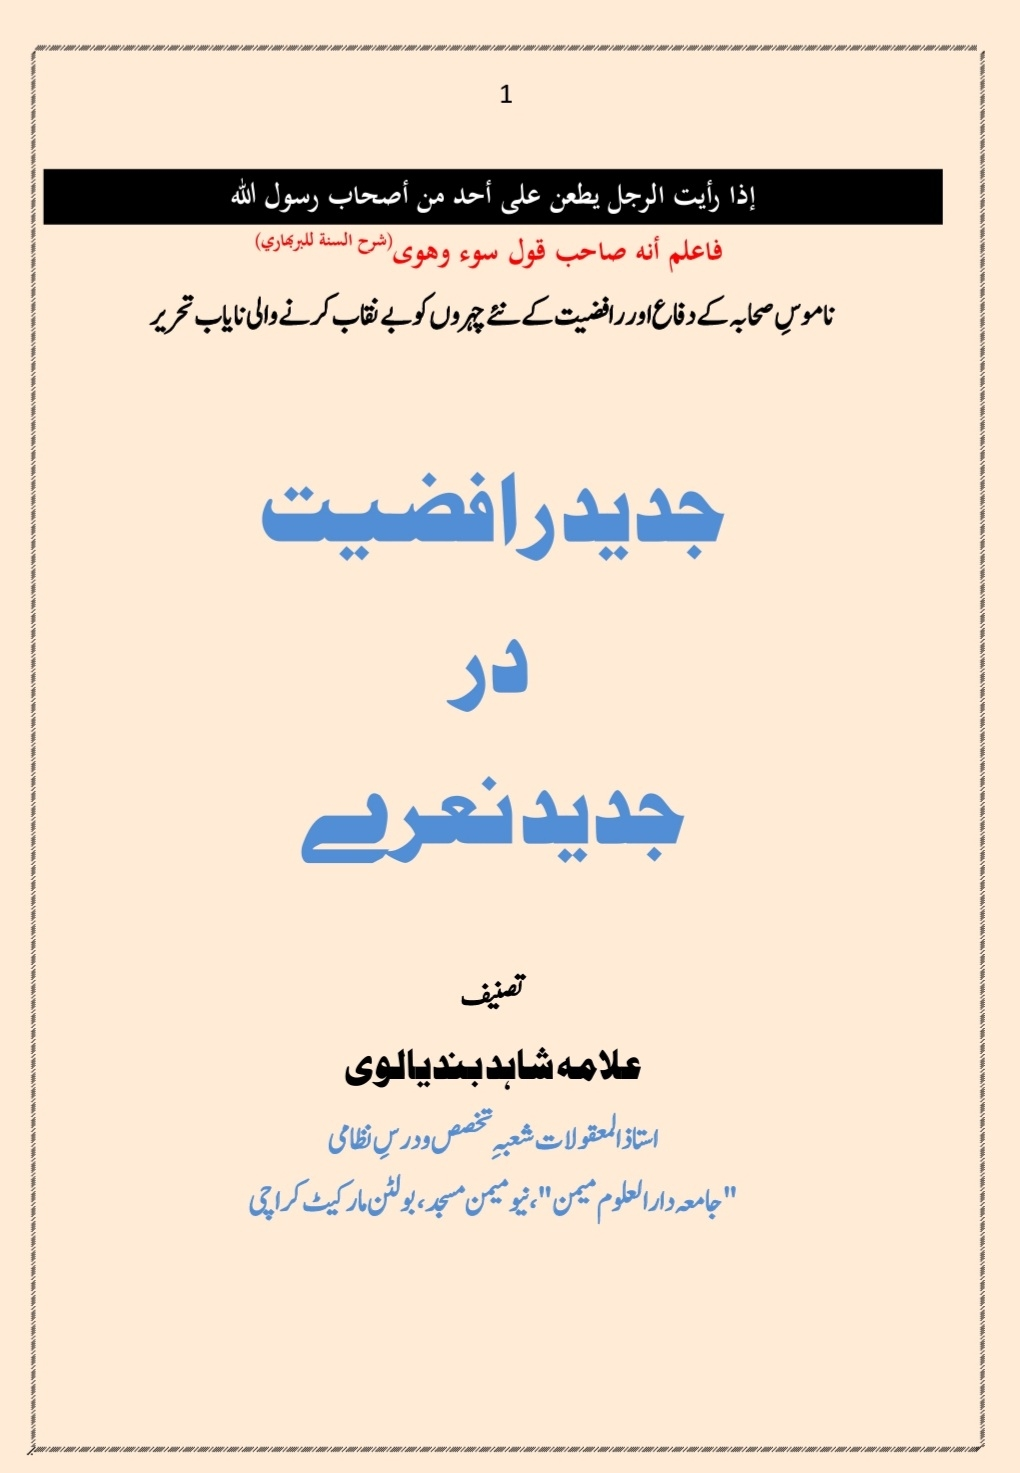 Jadeed Rafziyyat Dar Jadeed Nare / جدید رافضیت در جدید نعرےby مولانا مفتی شاہد بندیالوی